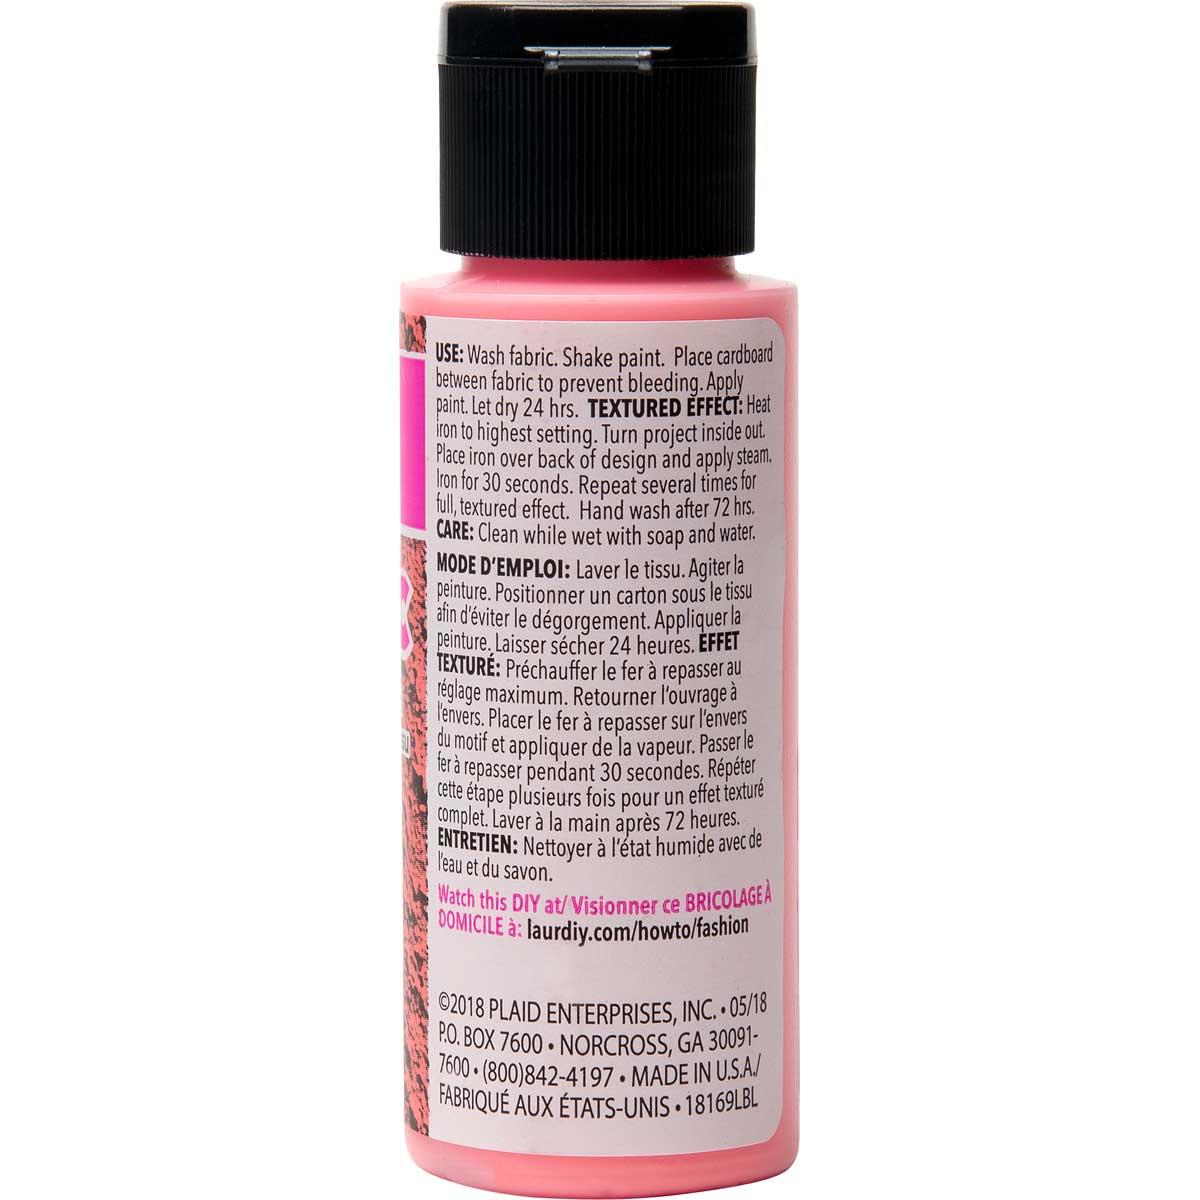 LaurDIY ® Texturific™ Fabric Paint - Girl Boss, 2 oz.